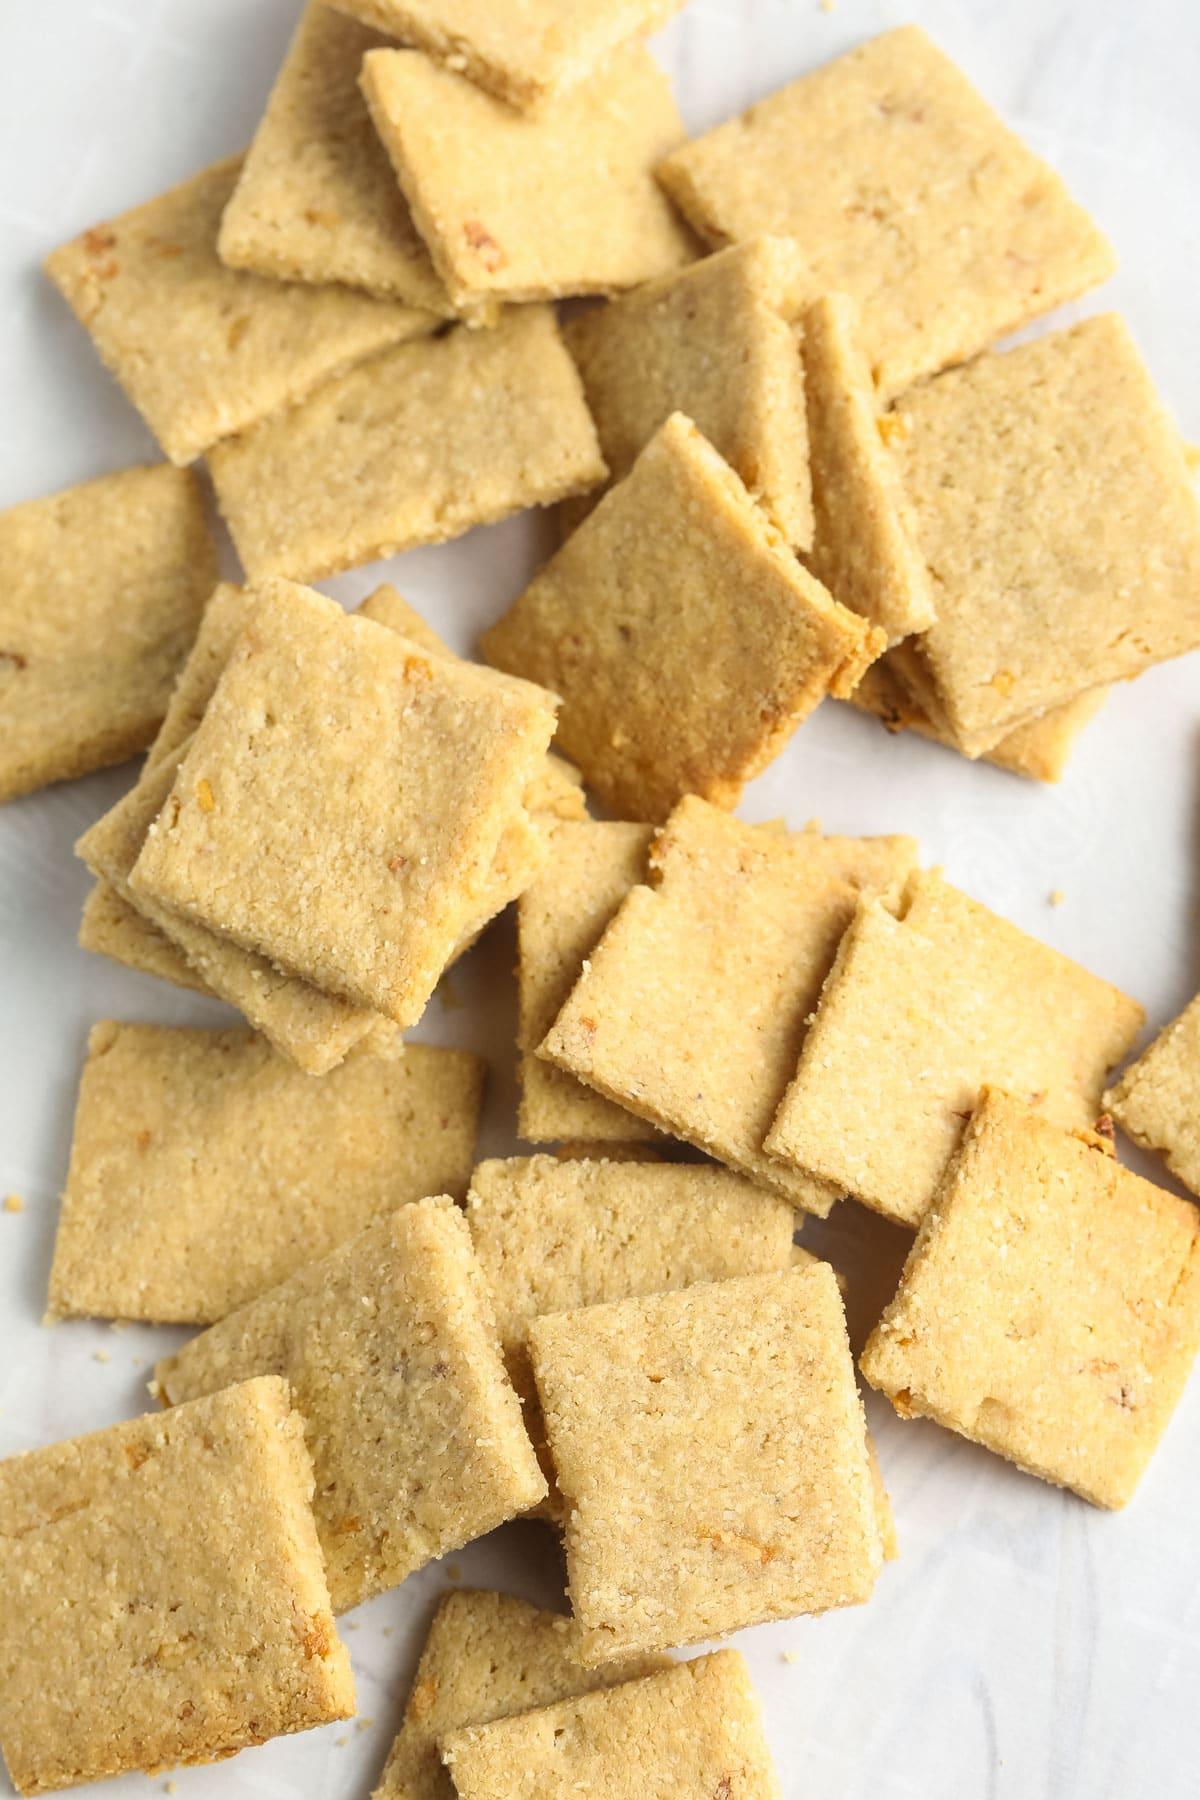 Easy French Onion Keto Crackers Recipe #ASpicyPerspective #paleo #whole30 #ketogenic